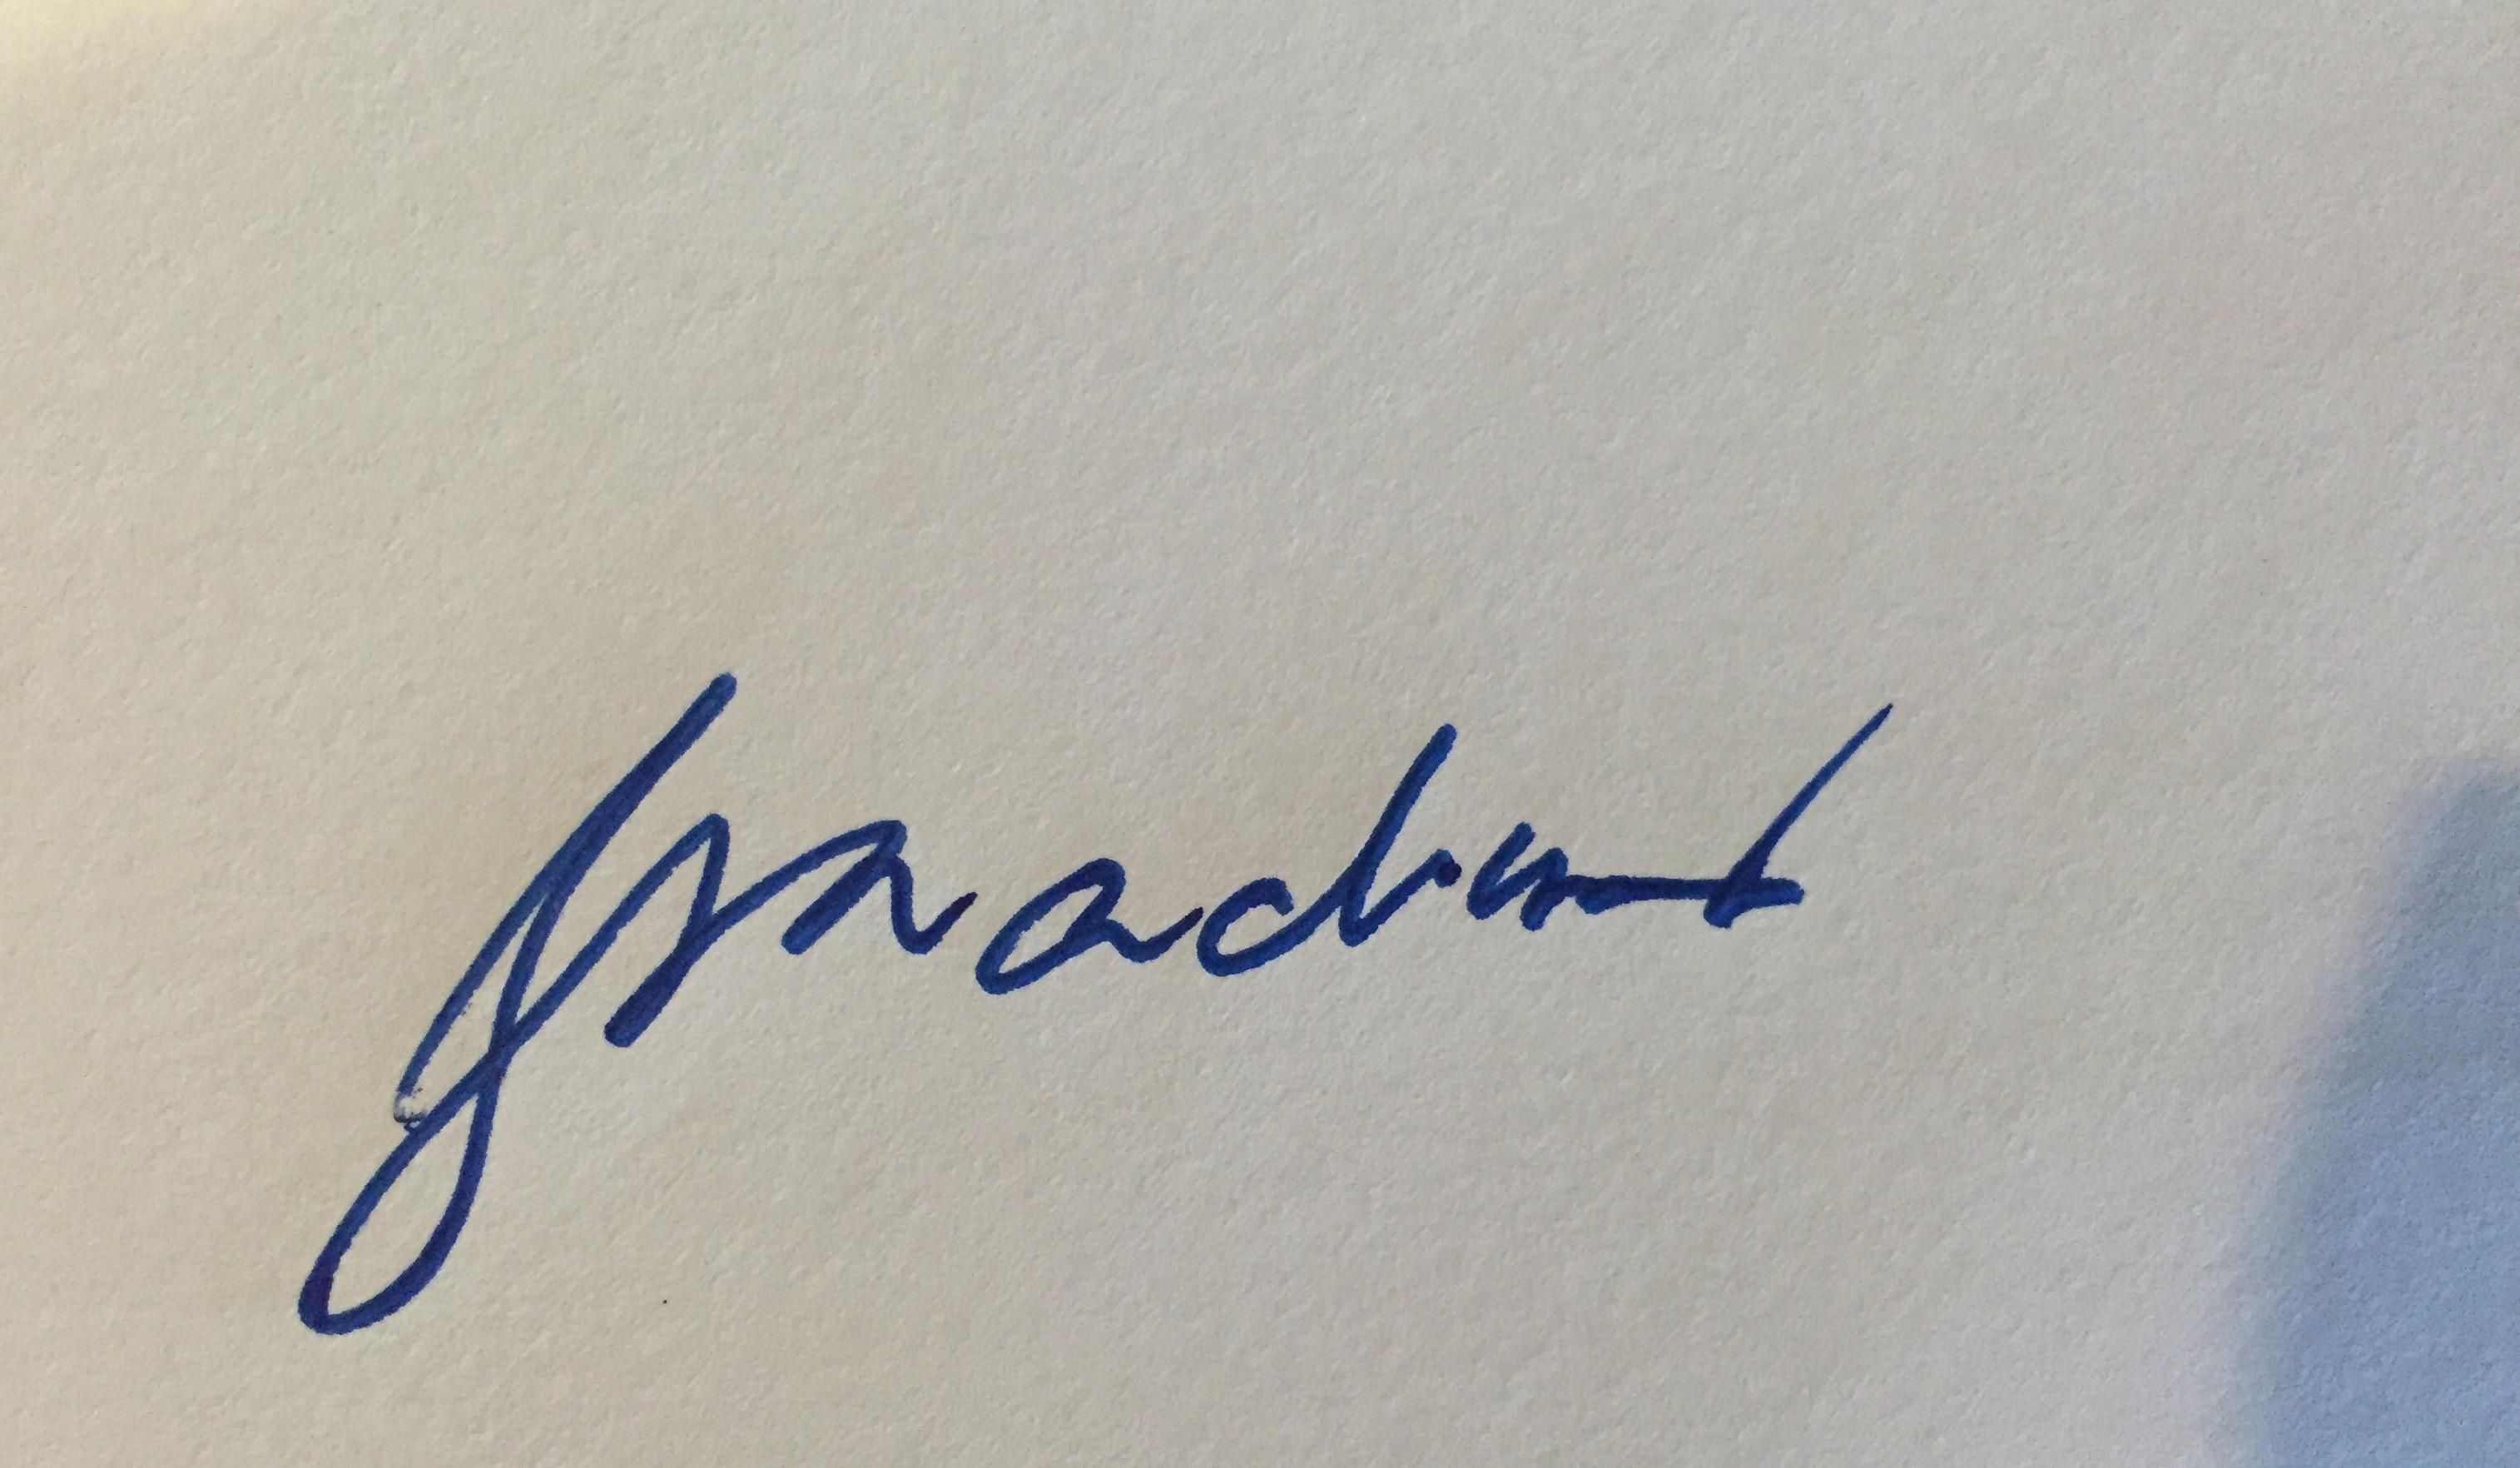 jay Maclean's Signature